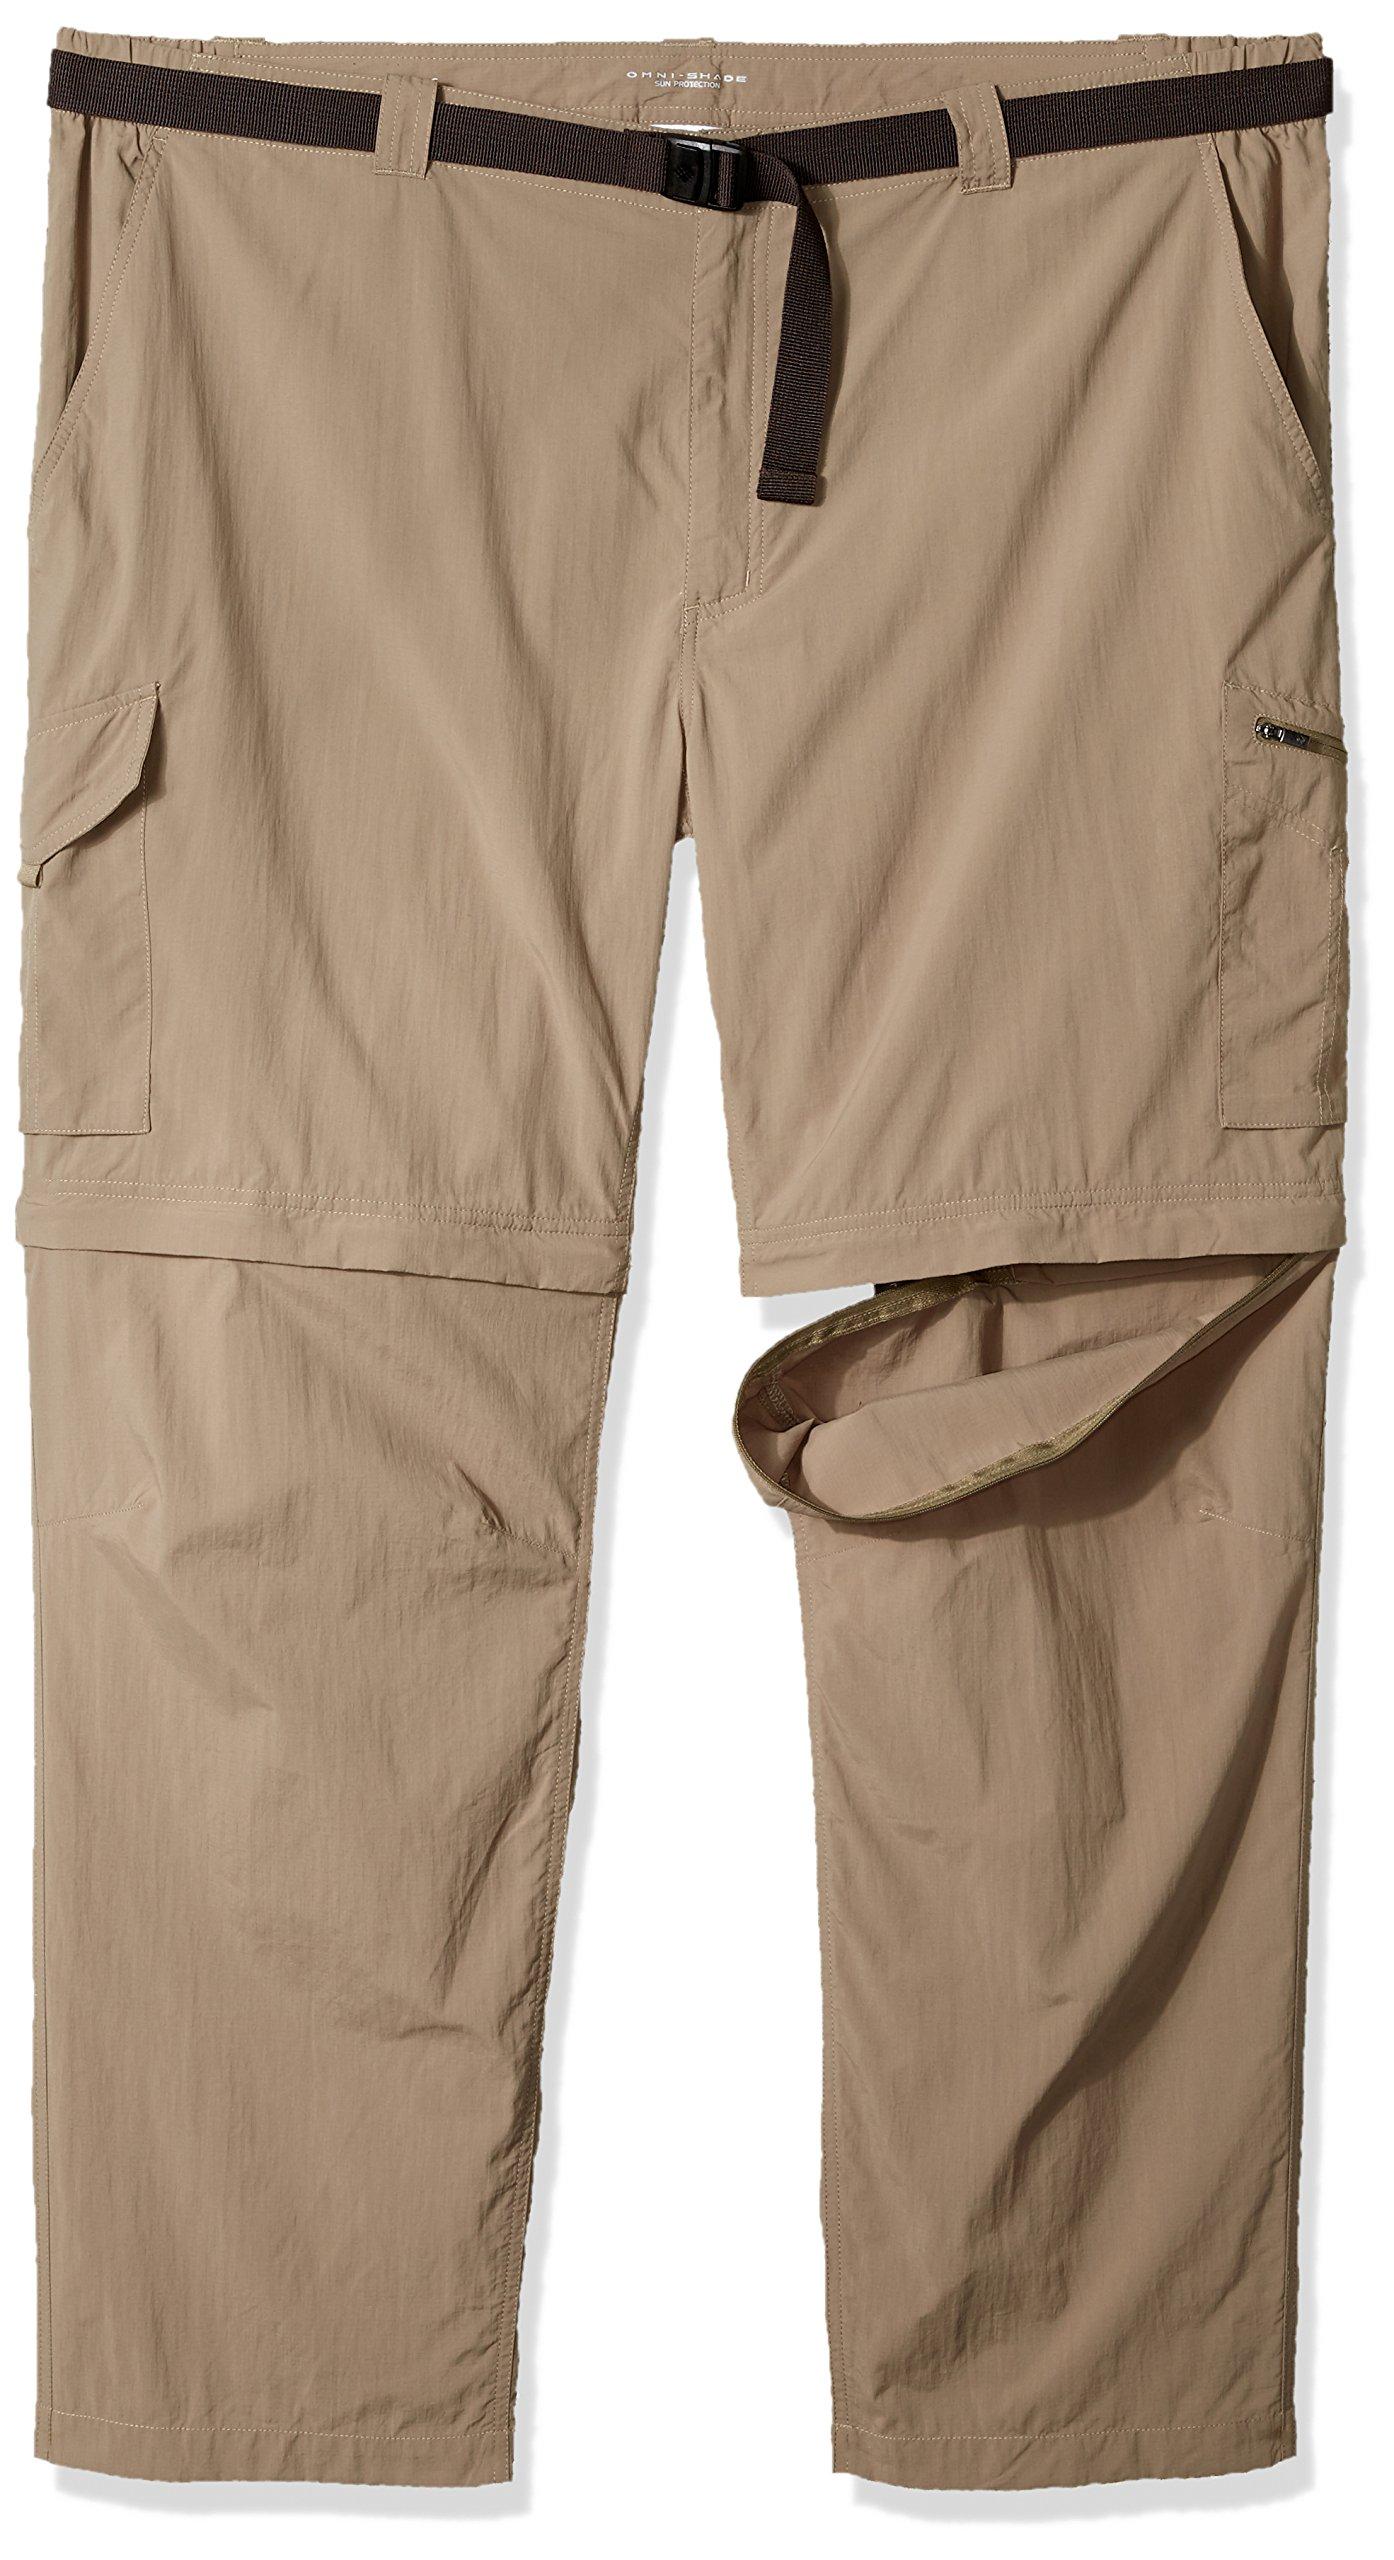 Columbia Men's Silver Ridge Big & Tall Convertible Pants, Sage, 44 x 34 by Columbia (Image #3)